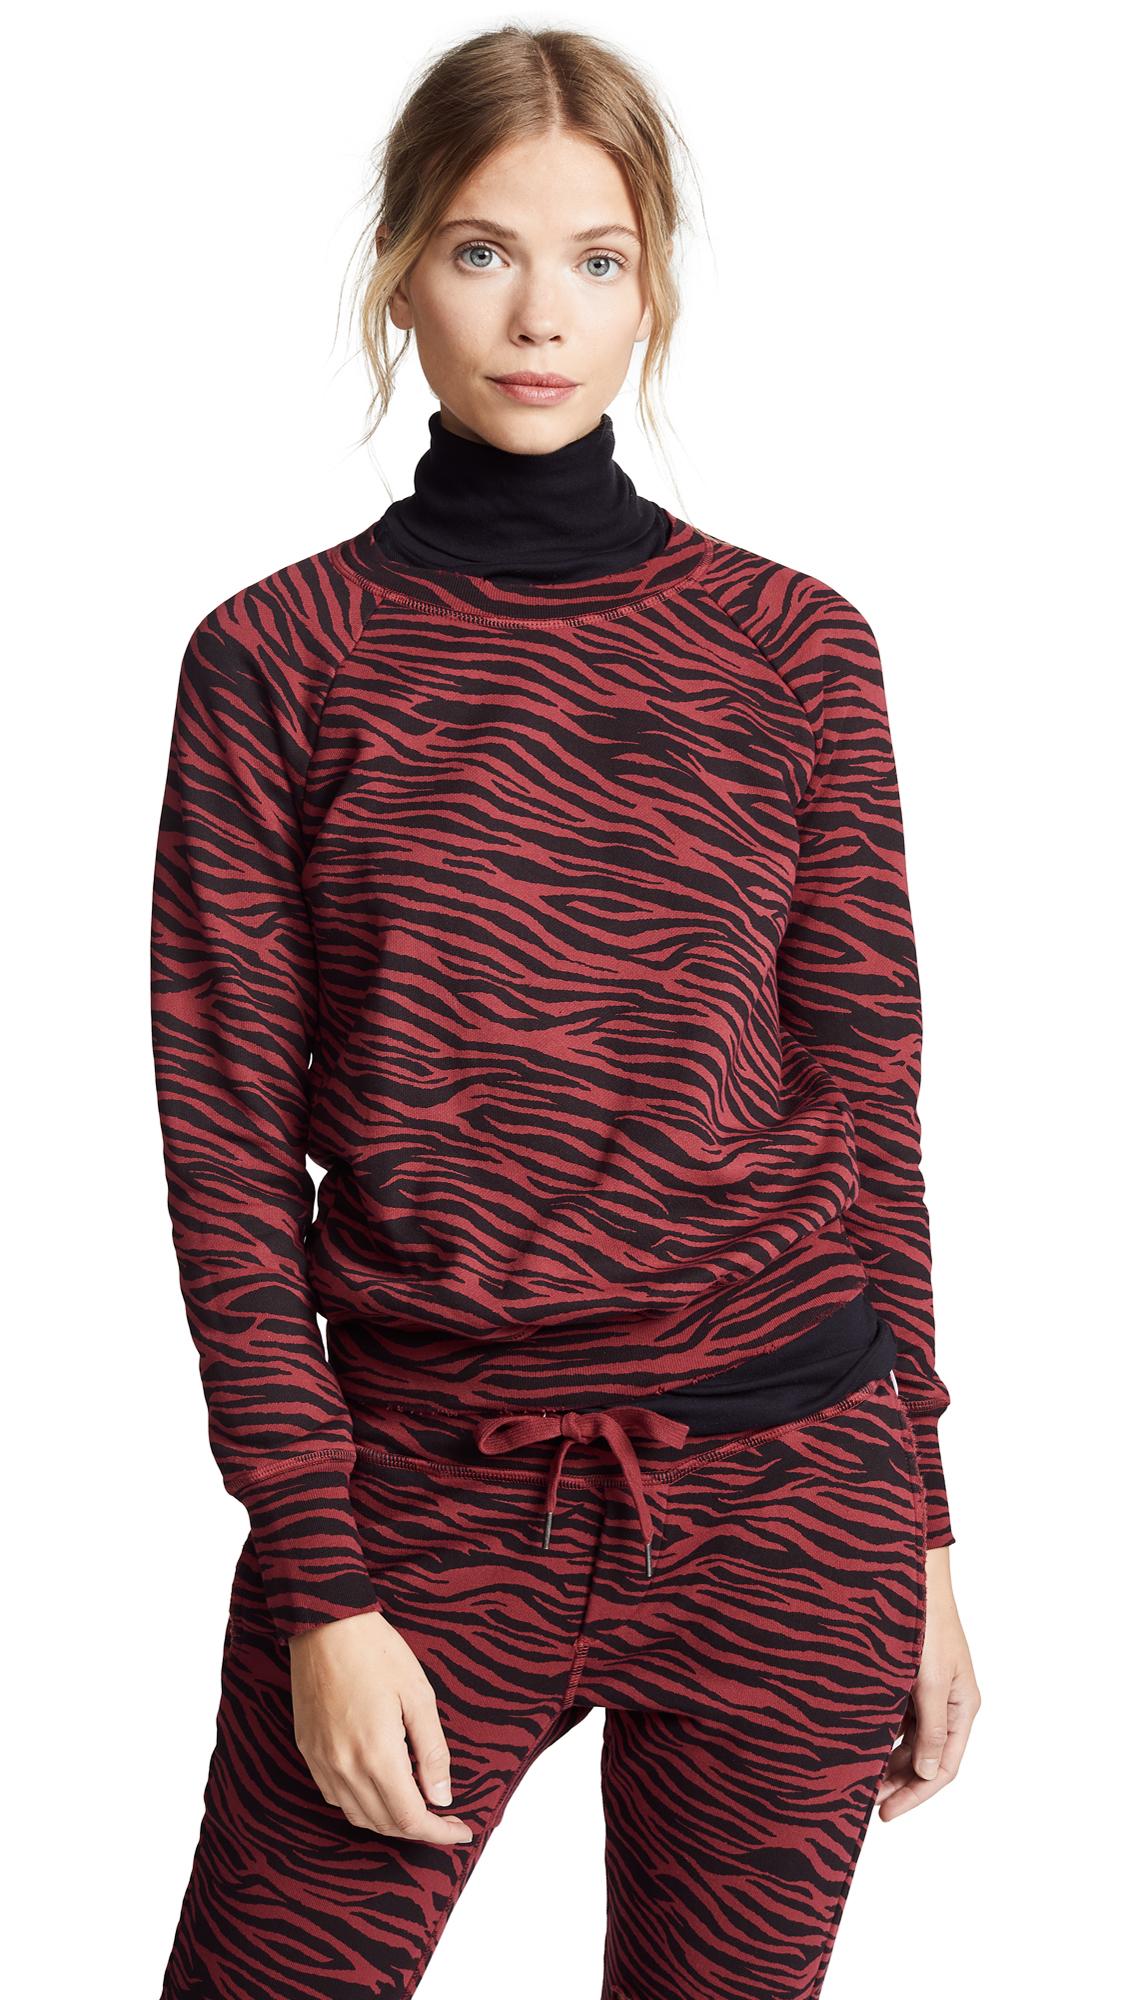 NSF Saguro Shrunken Sweatshirt in Well Red Tiger